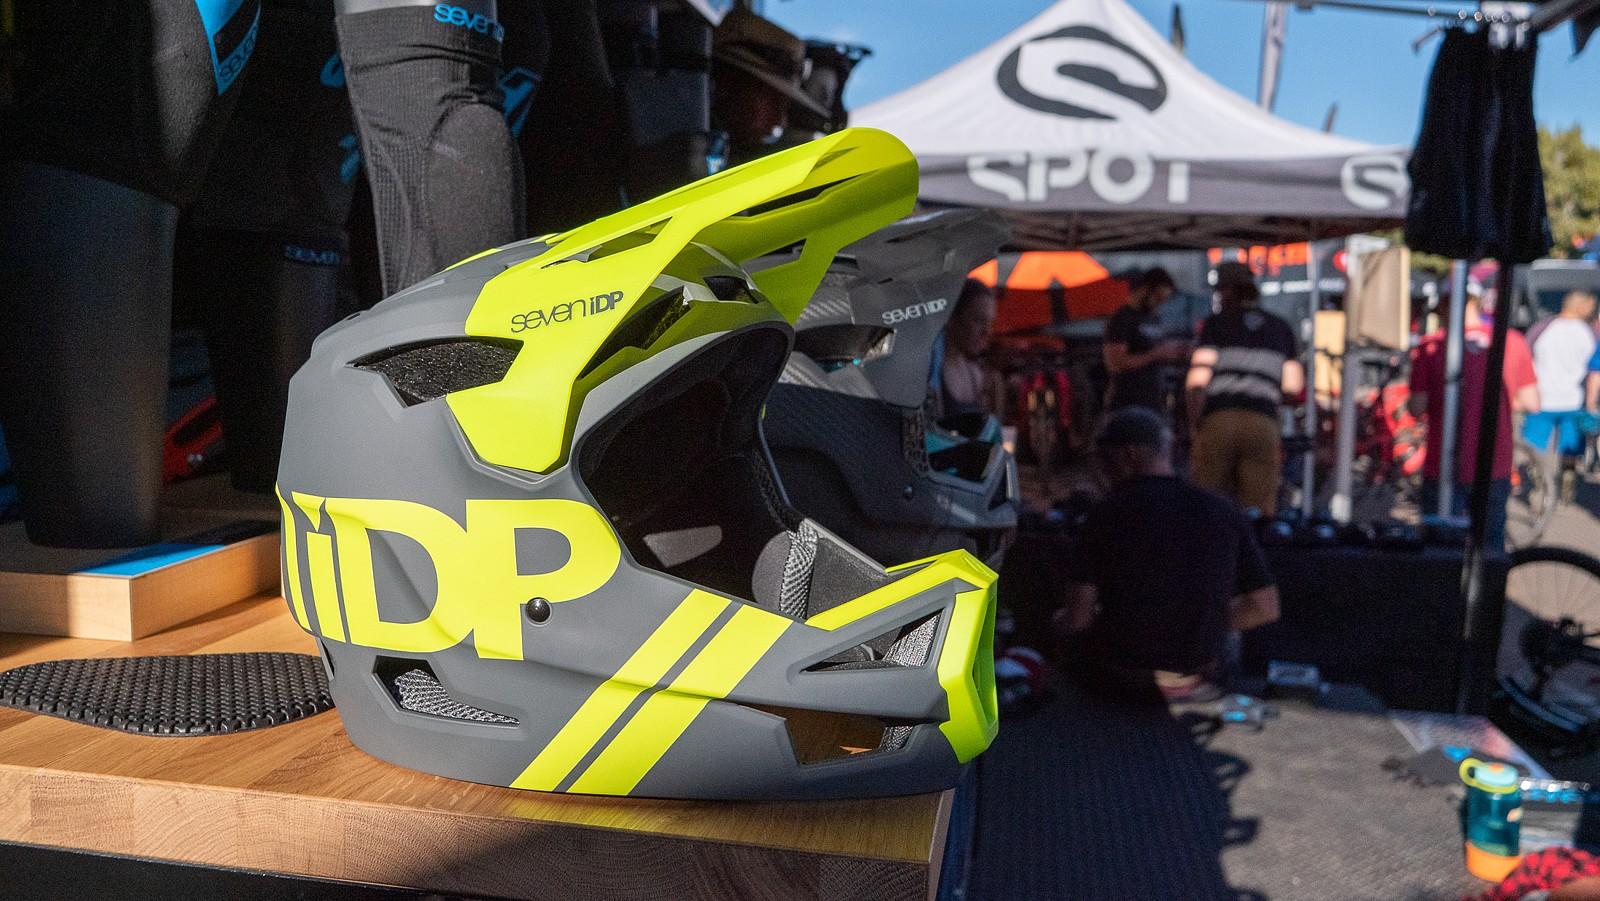 PIT BITS - Sedona Bike Fest 2020 - 7iDP - PIT BITS 2 - Sedona Bike Festival 2020 - Mountain Biking Pictures - Vital MTB